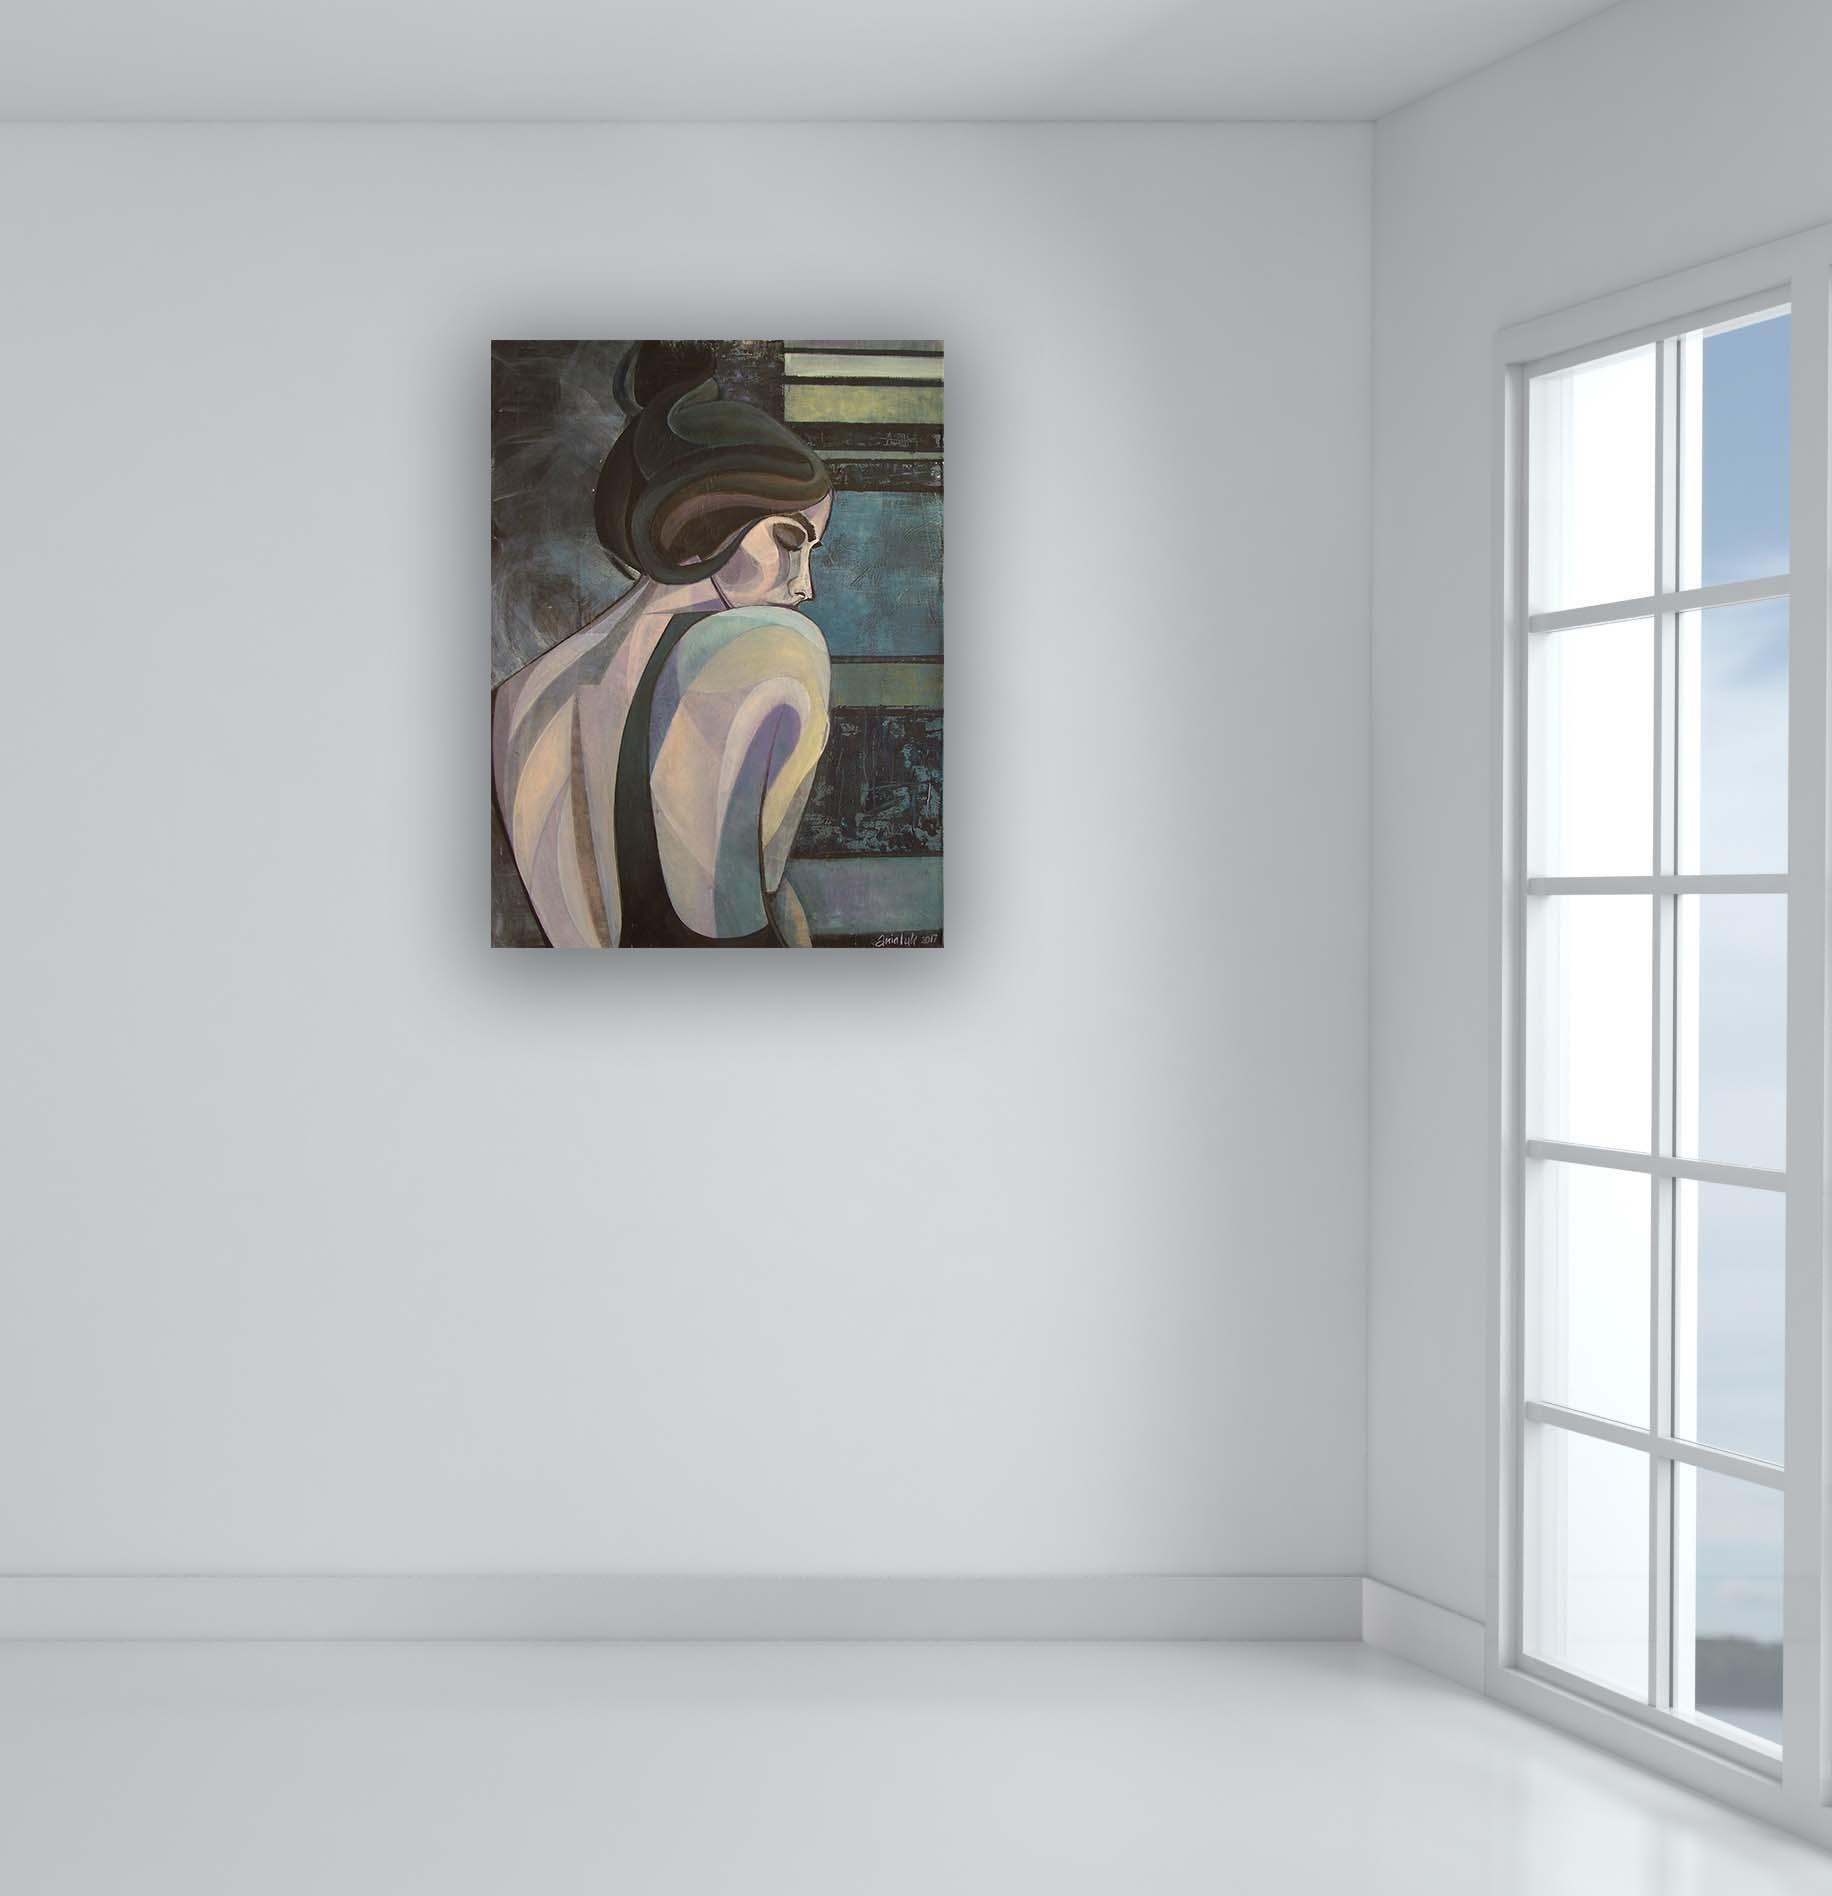 Sensual 2 Painting Of Beautiful Woman Inspiredart Deco With Sensual Wall Art (Image 11 of 20)